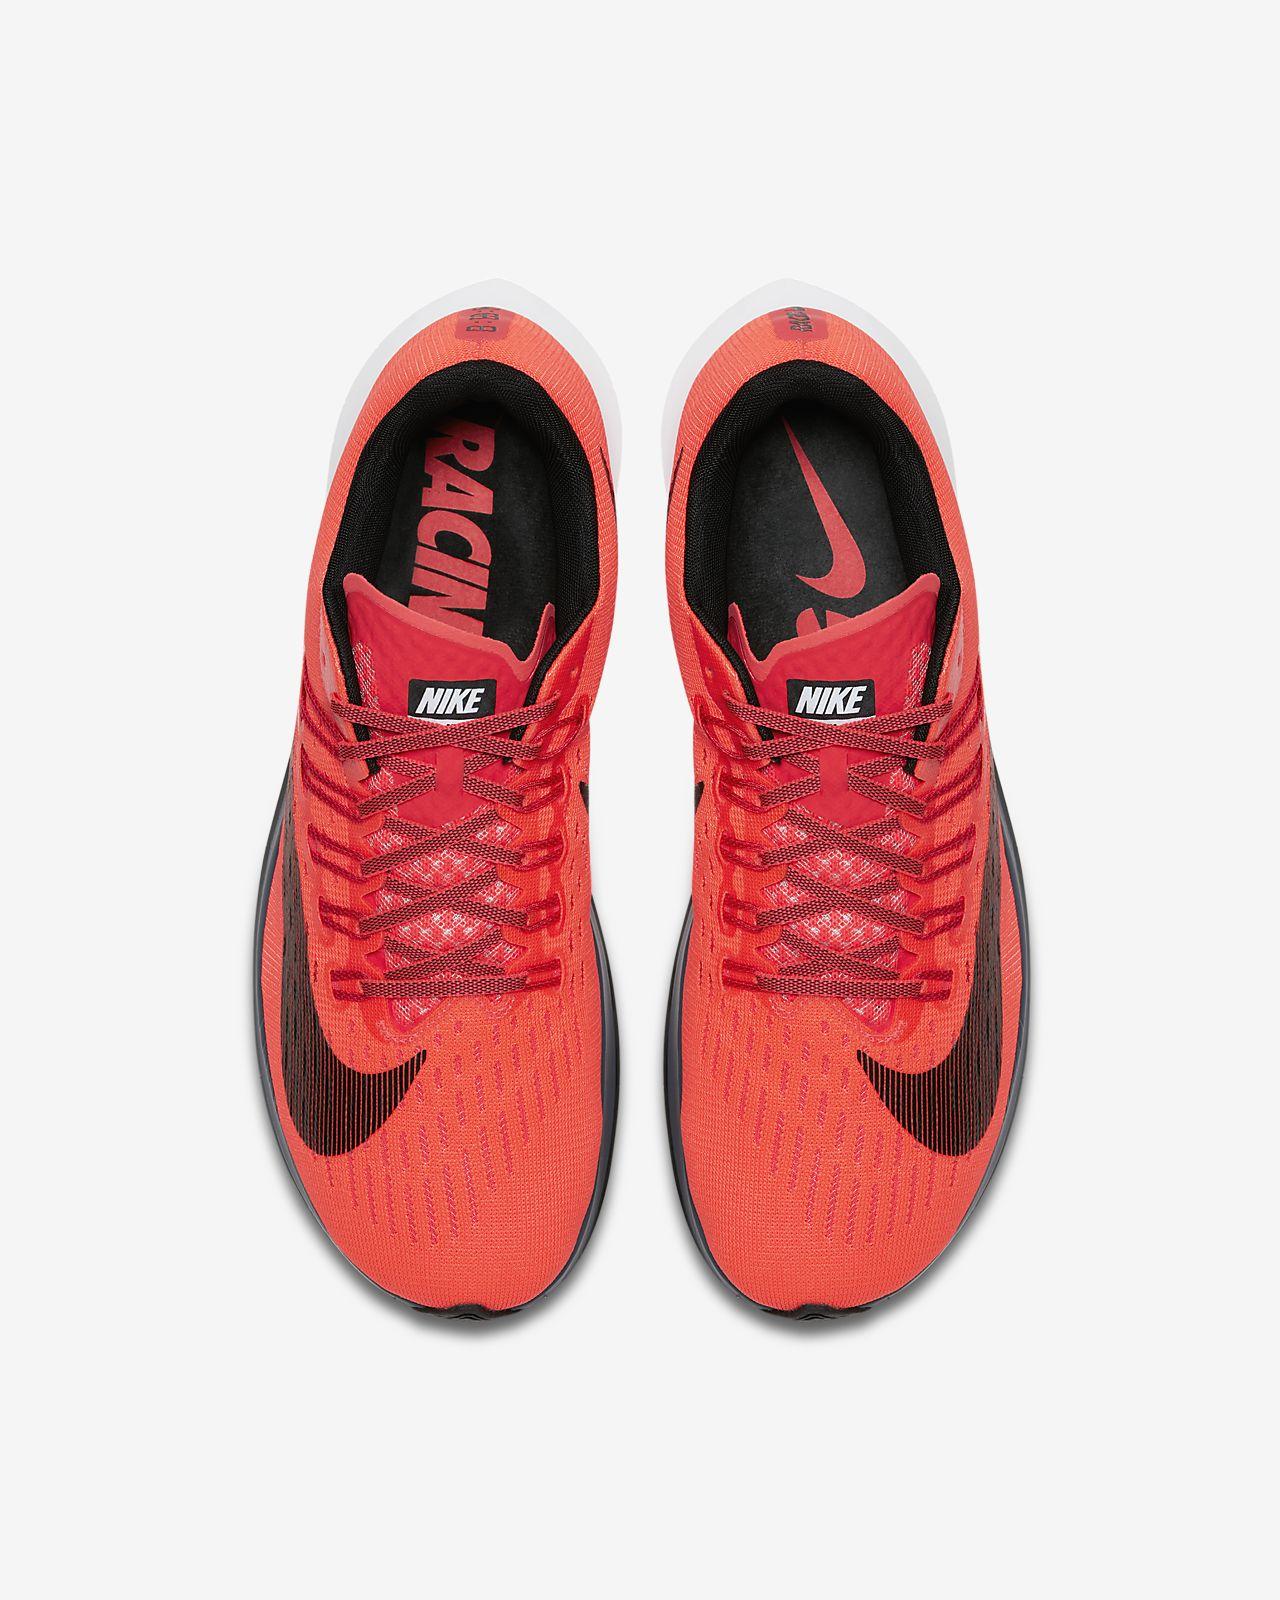 5a1466e9e6fe Nike Zoom Fly Herren-Laufschuh. Nike.com CH